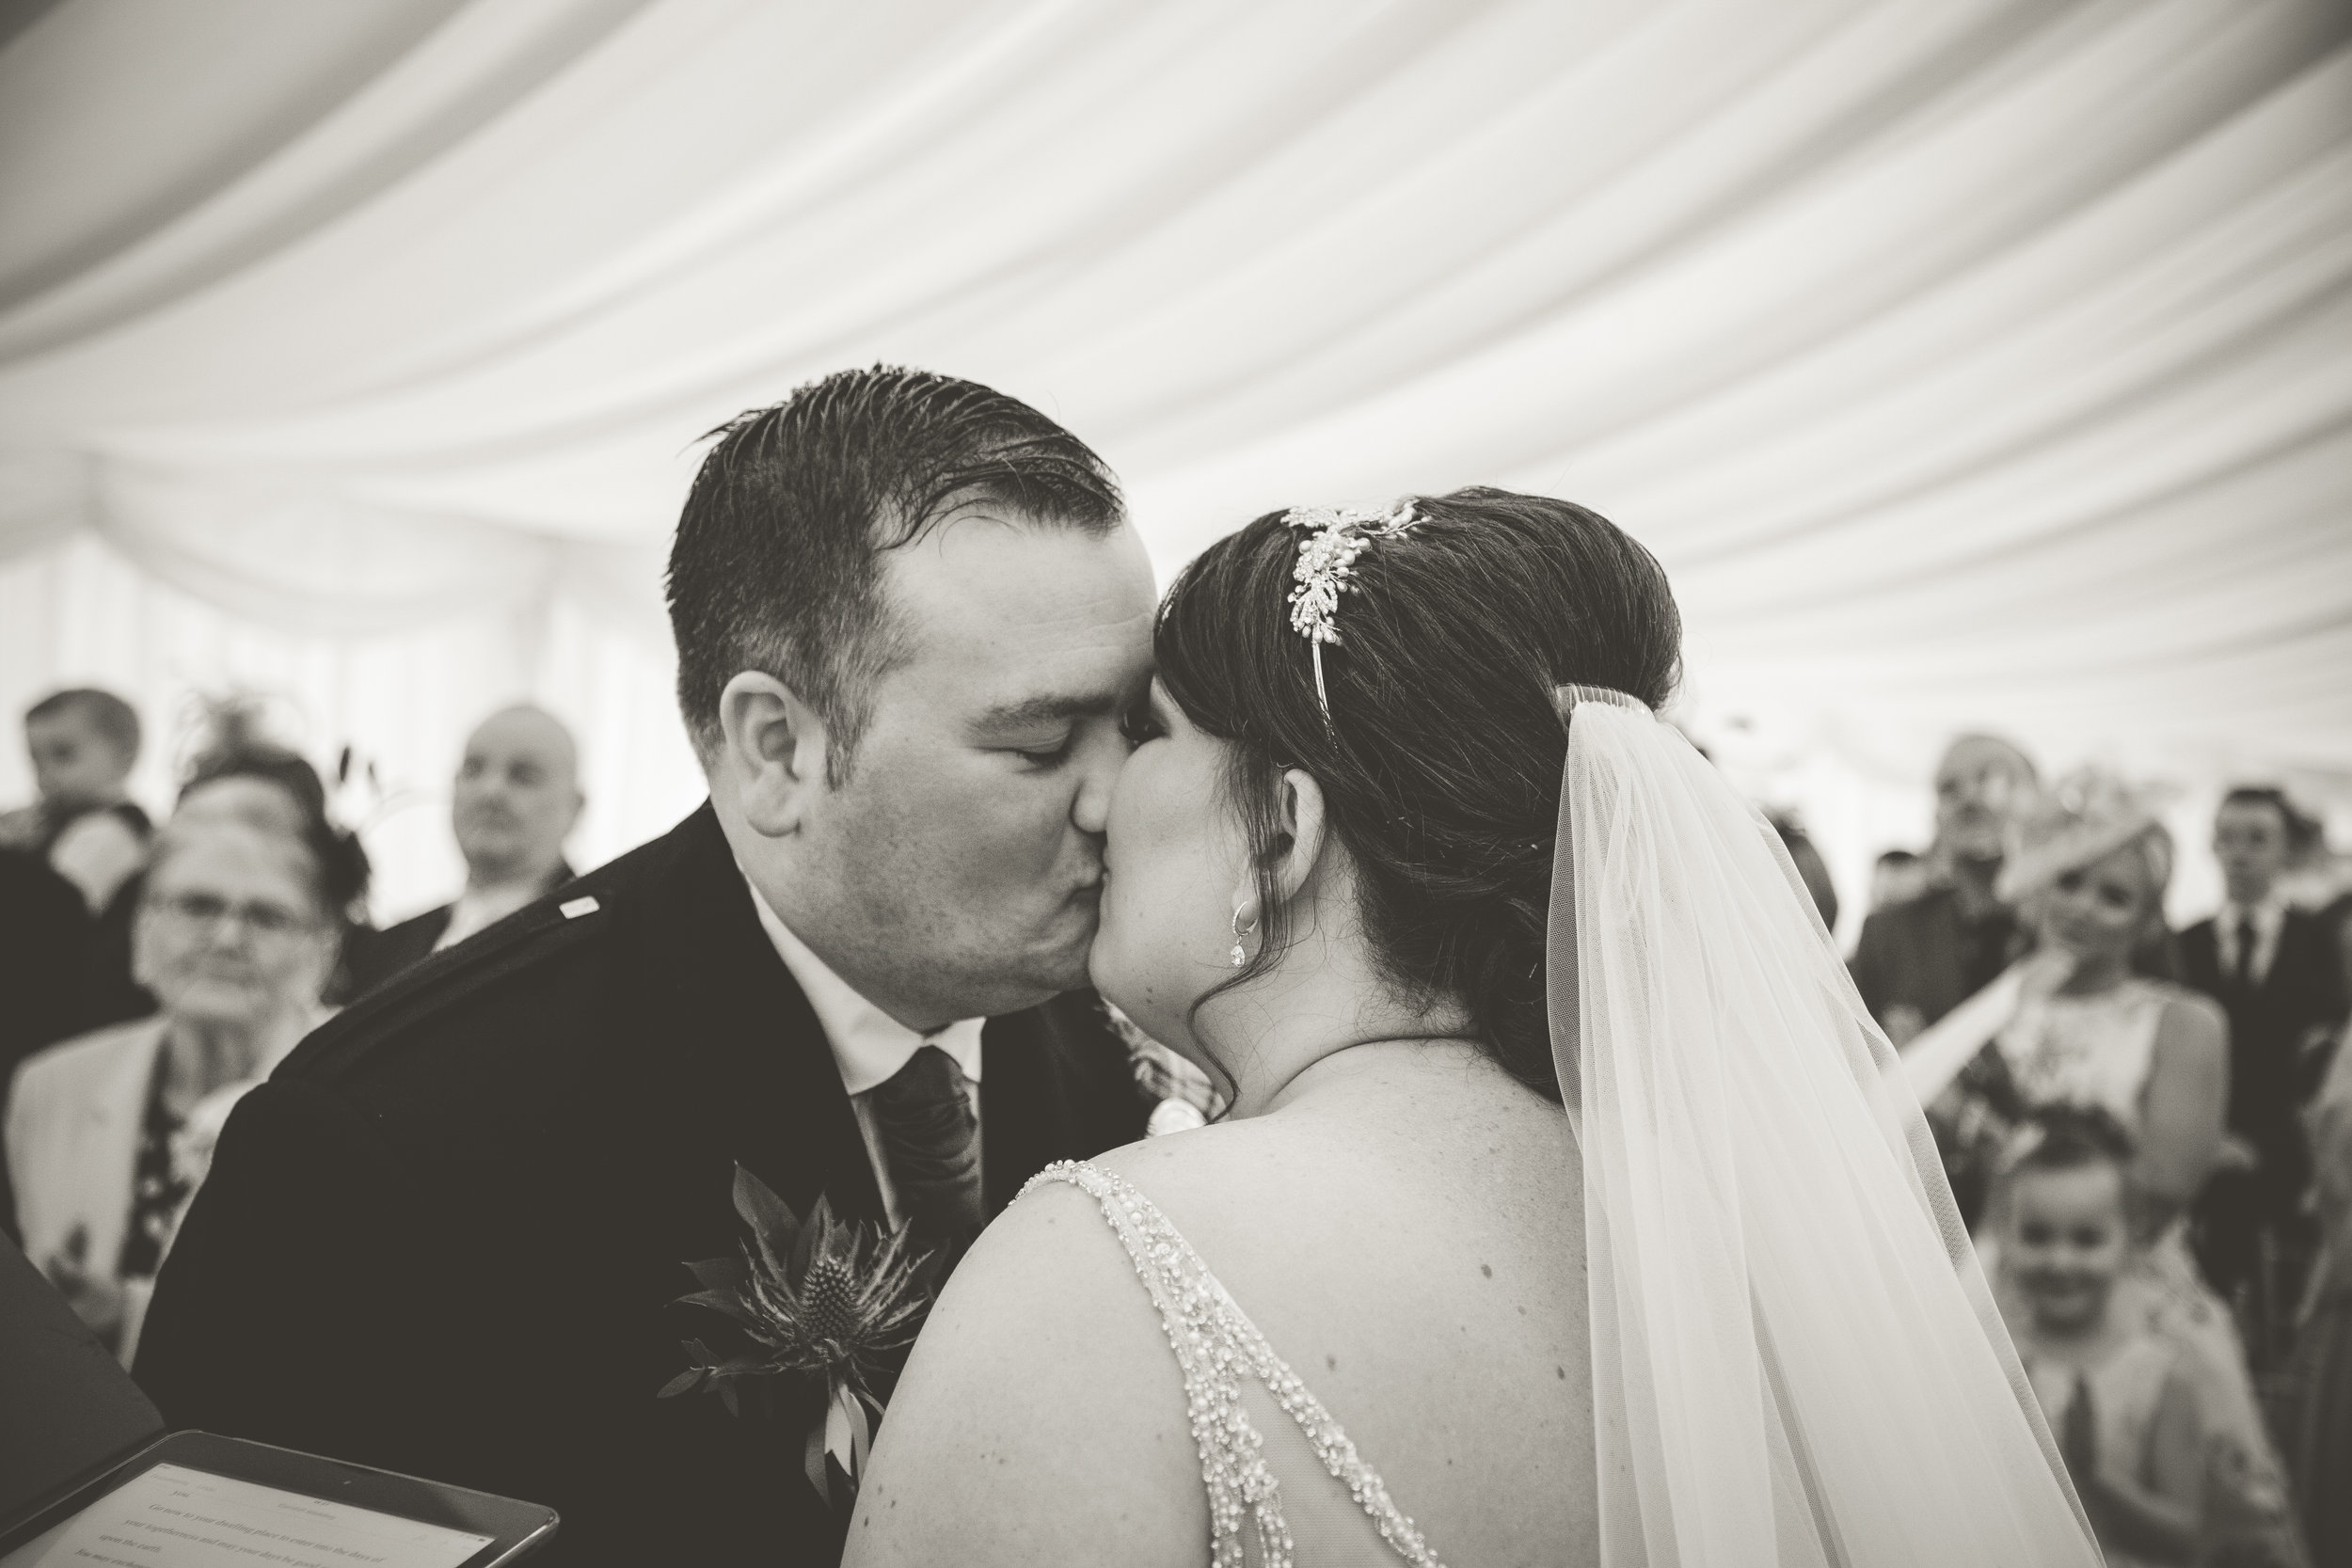 Mr&MrsBrown_085-2.jpg